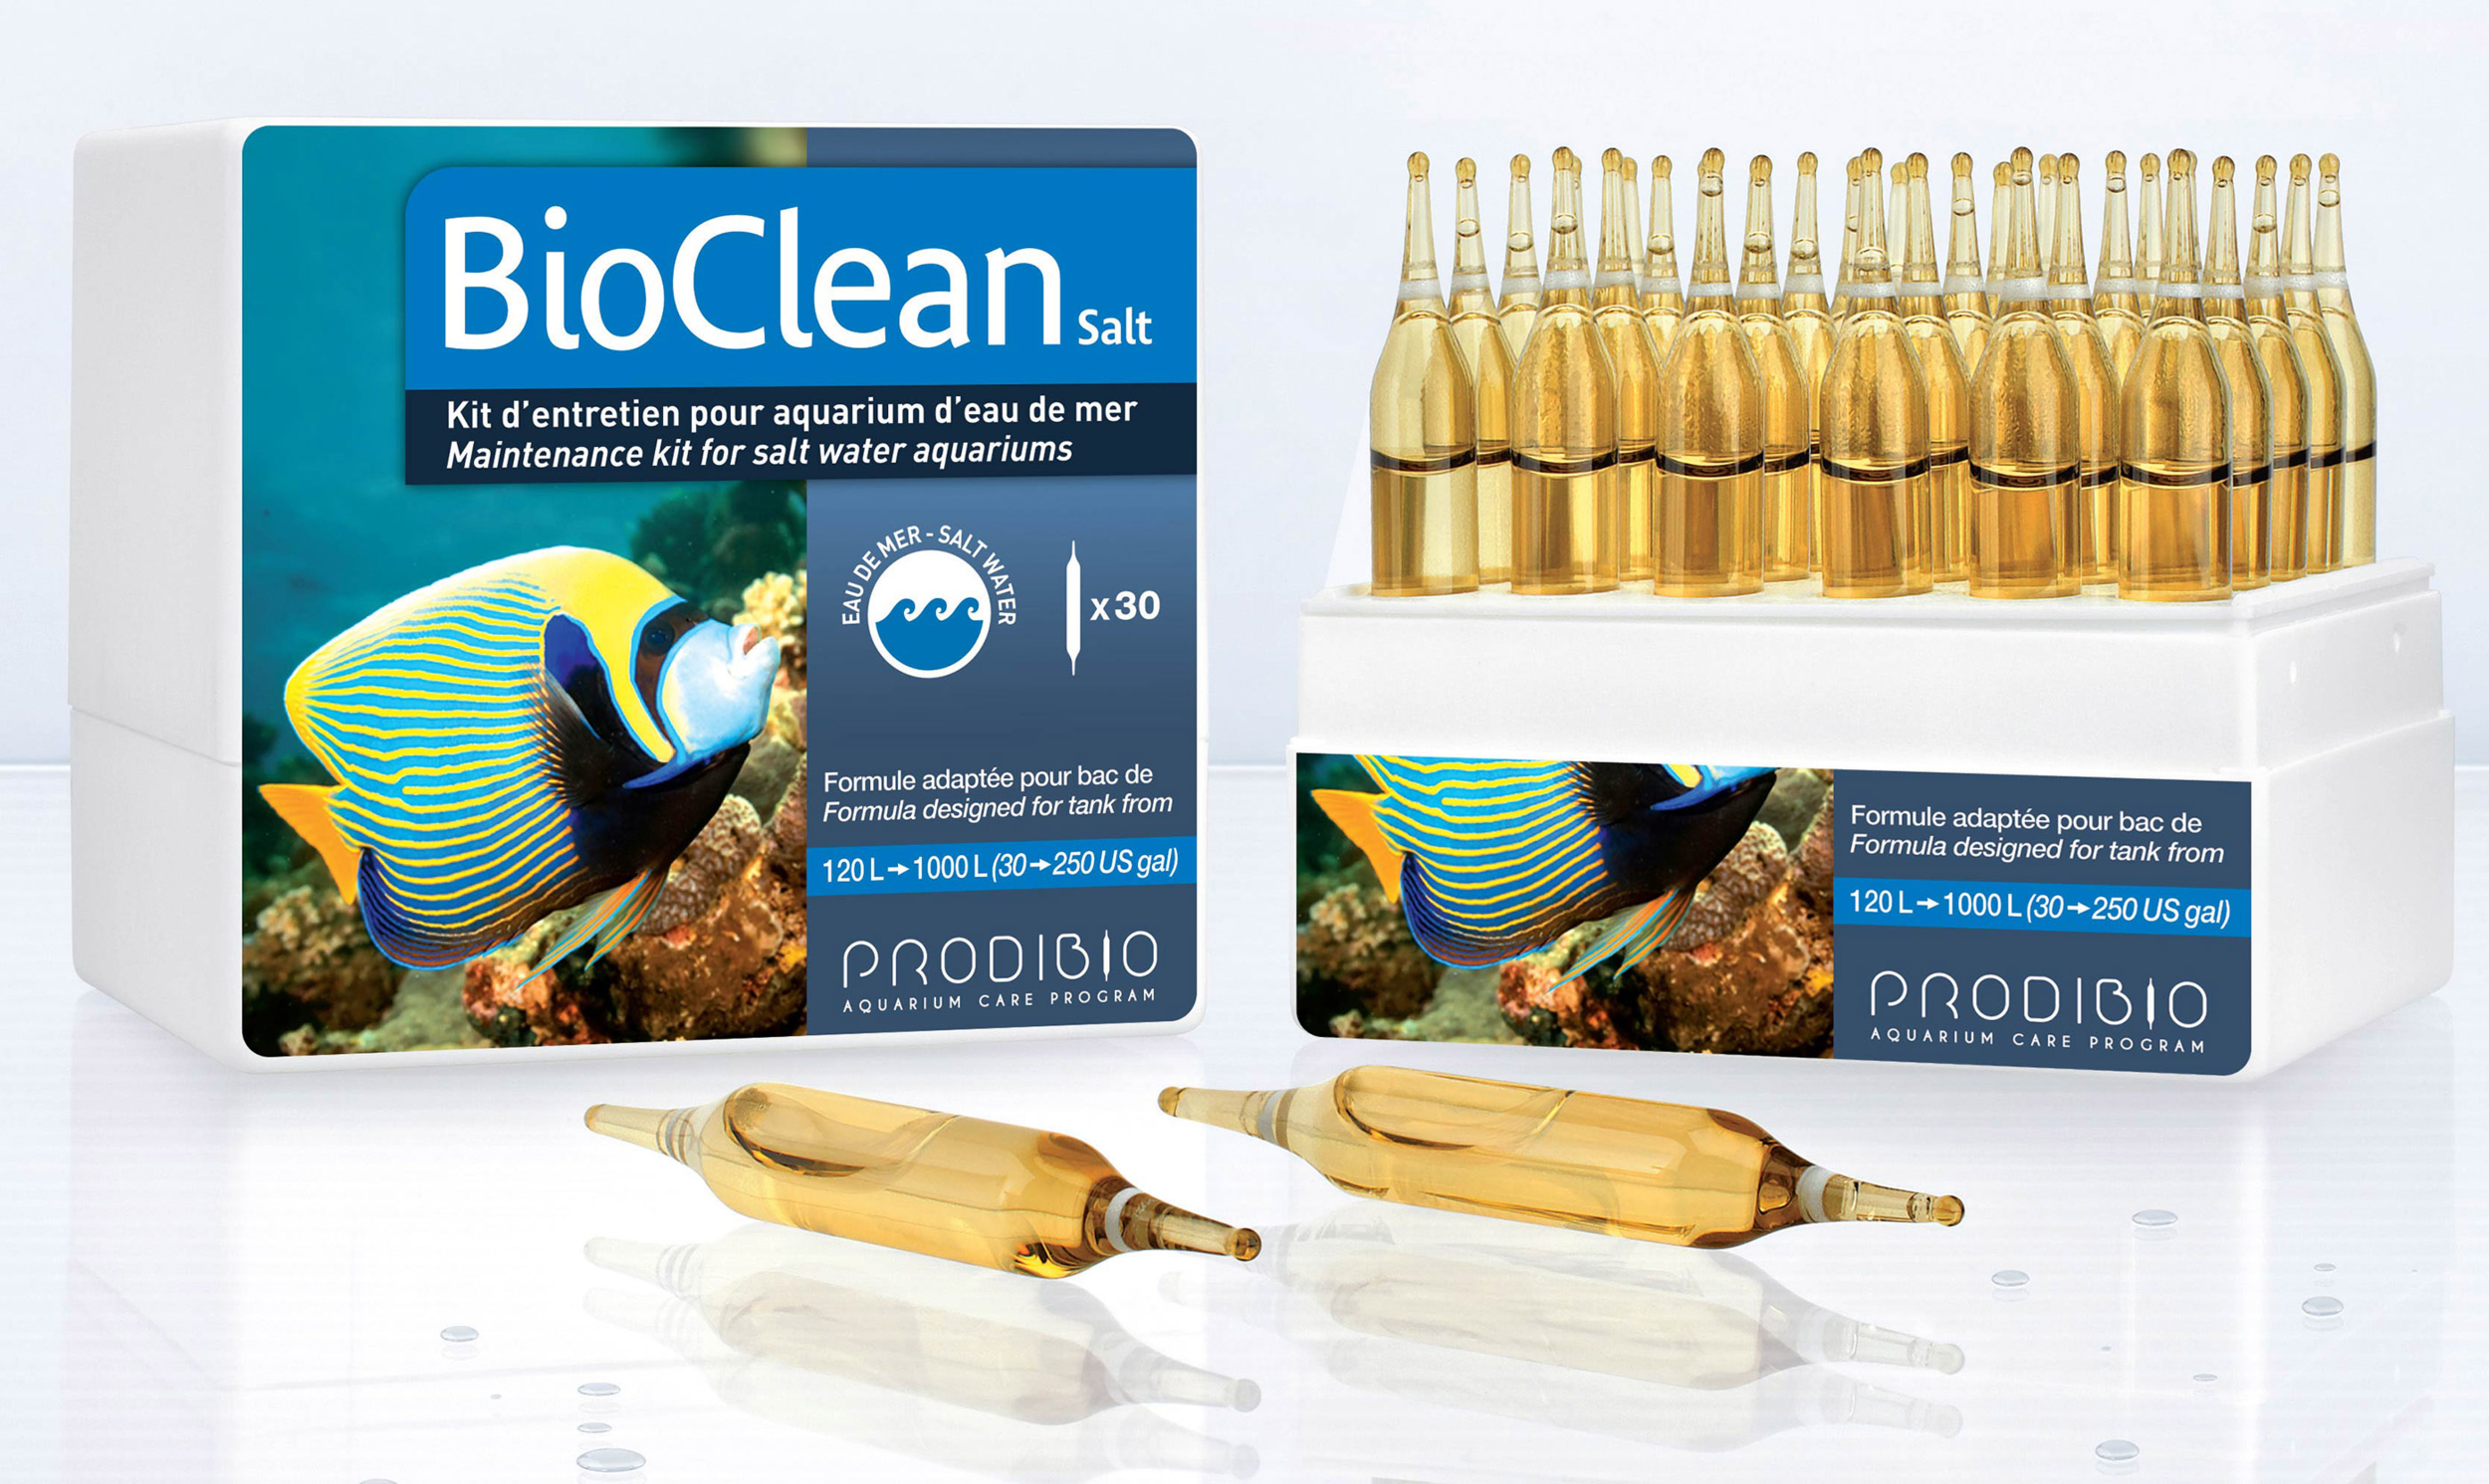 bioclean_salt_-_30_-_prodibio